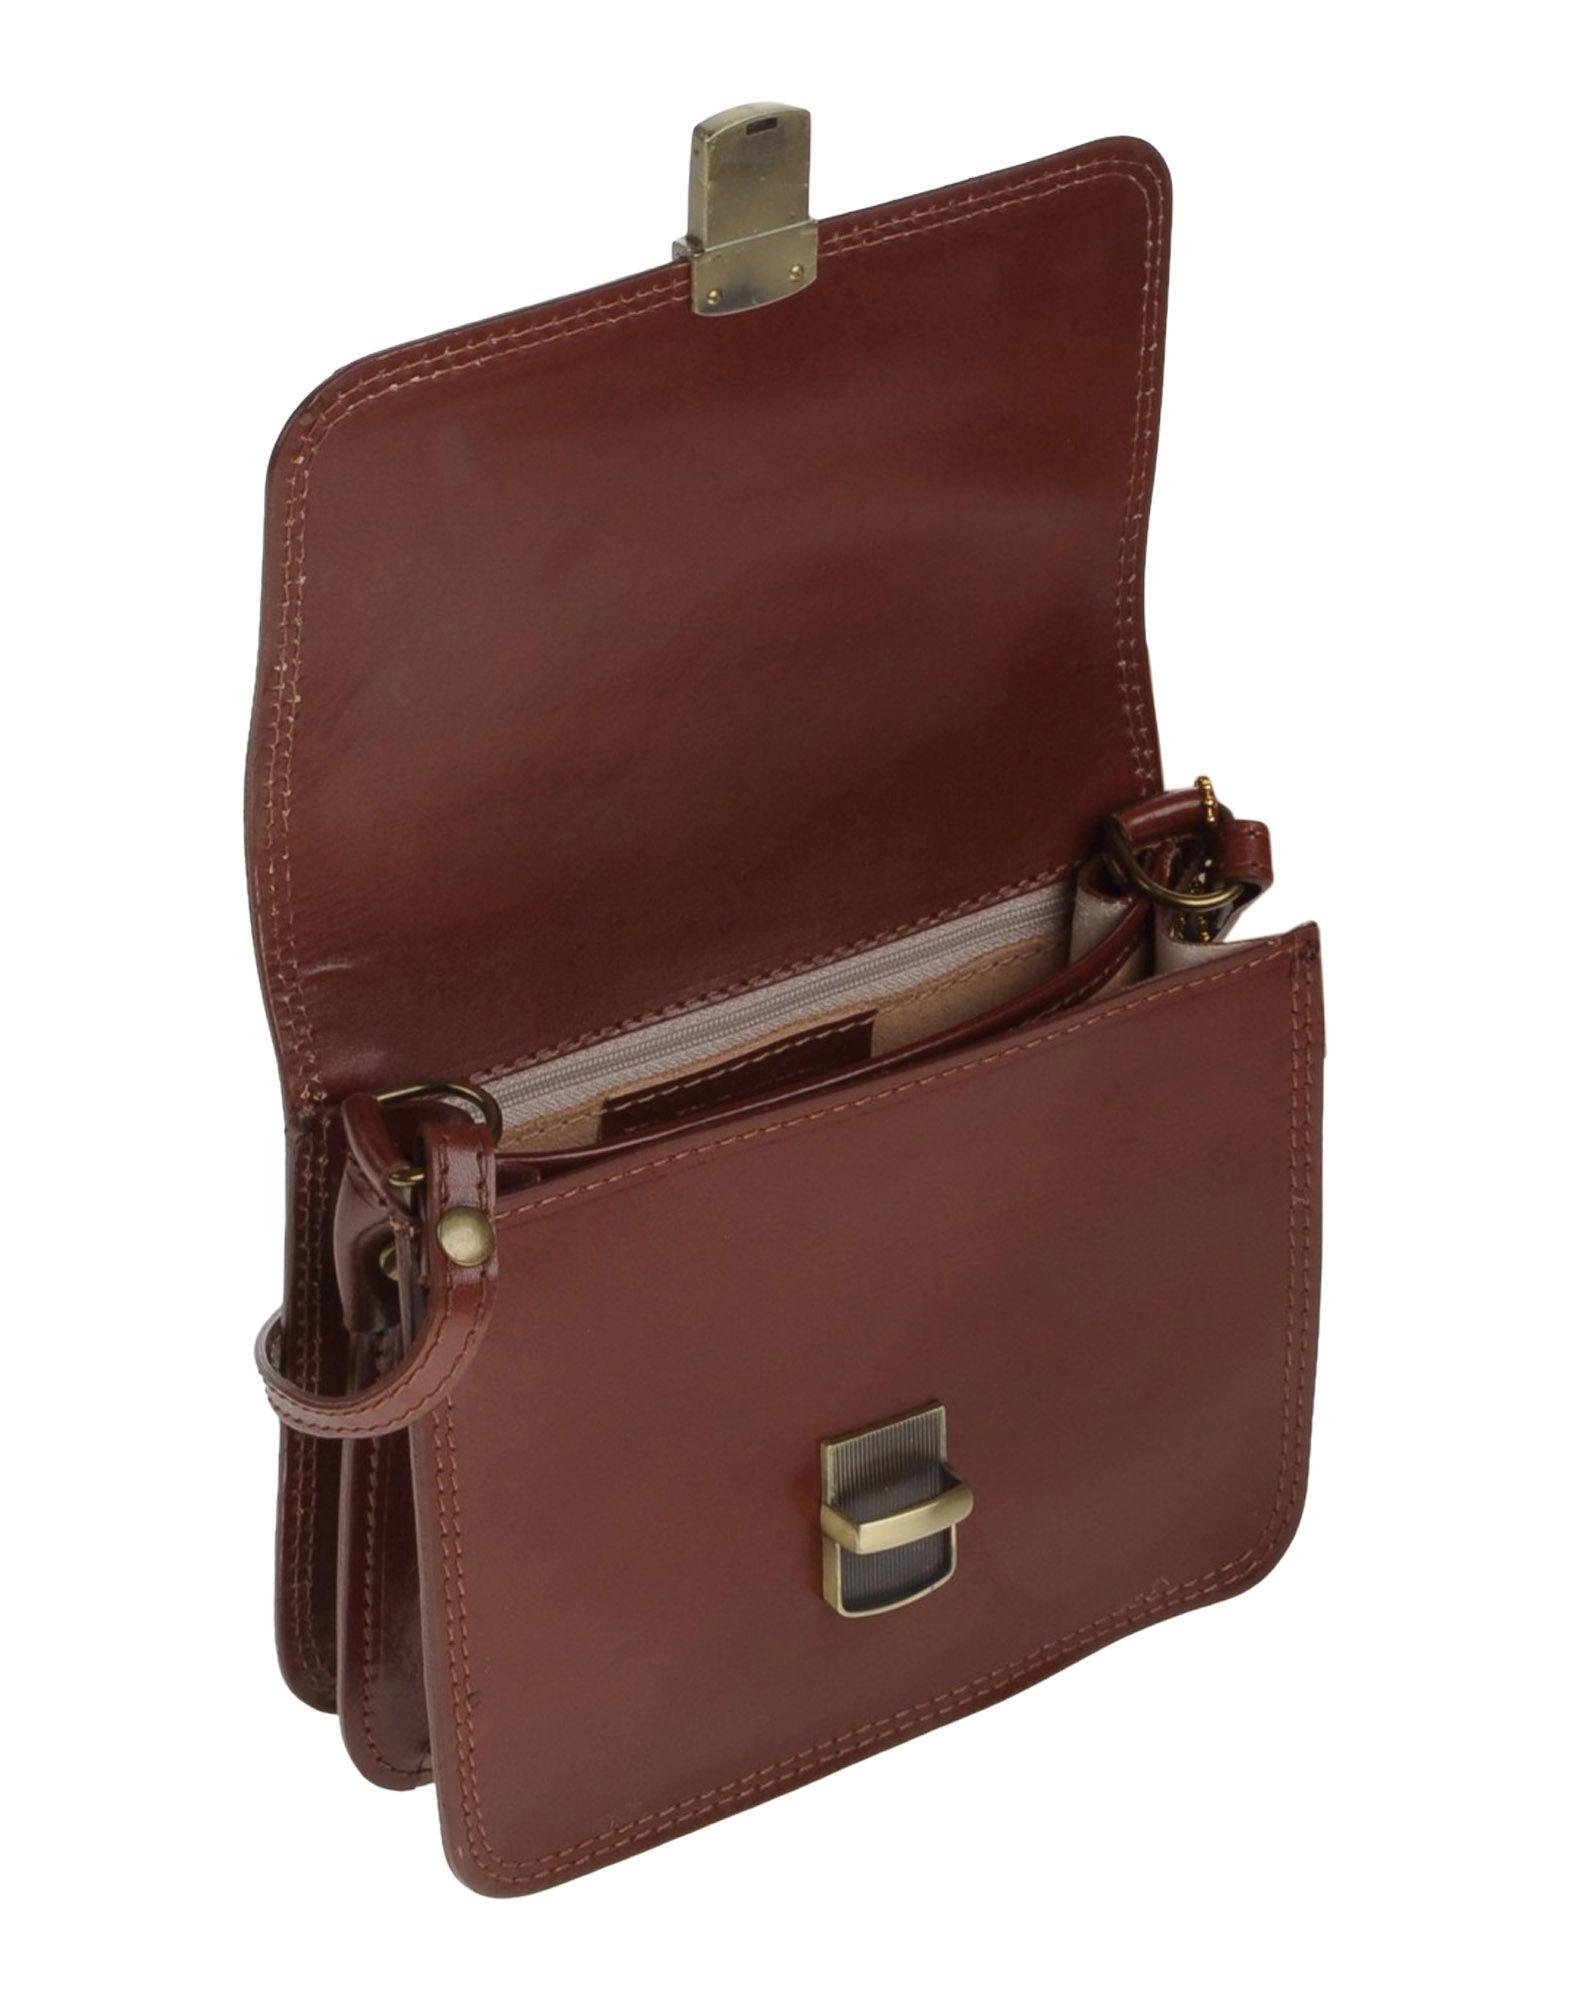 Ore10 Leather Cross-body Bag